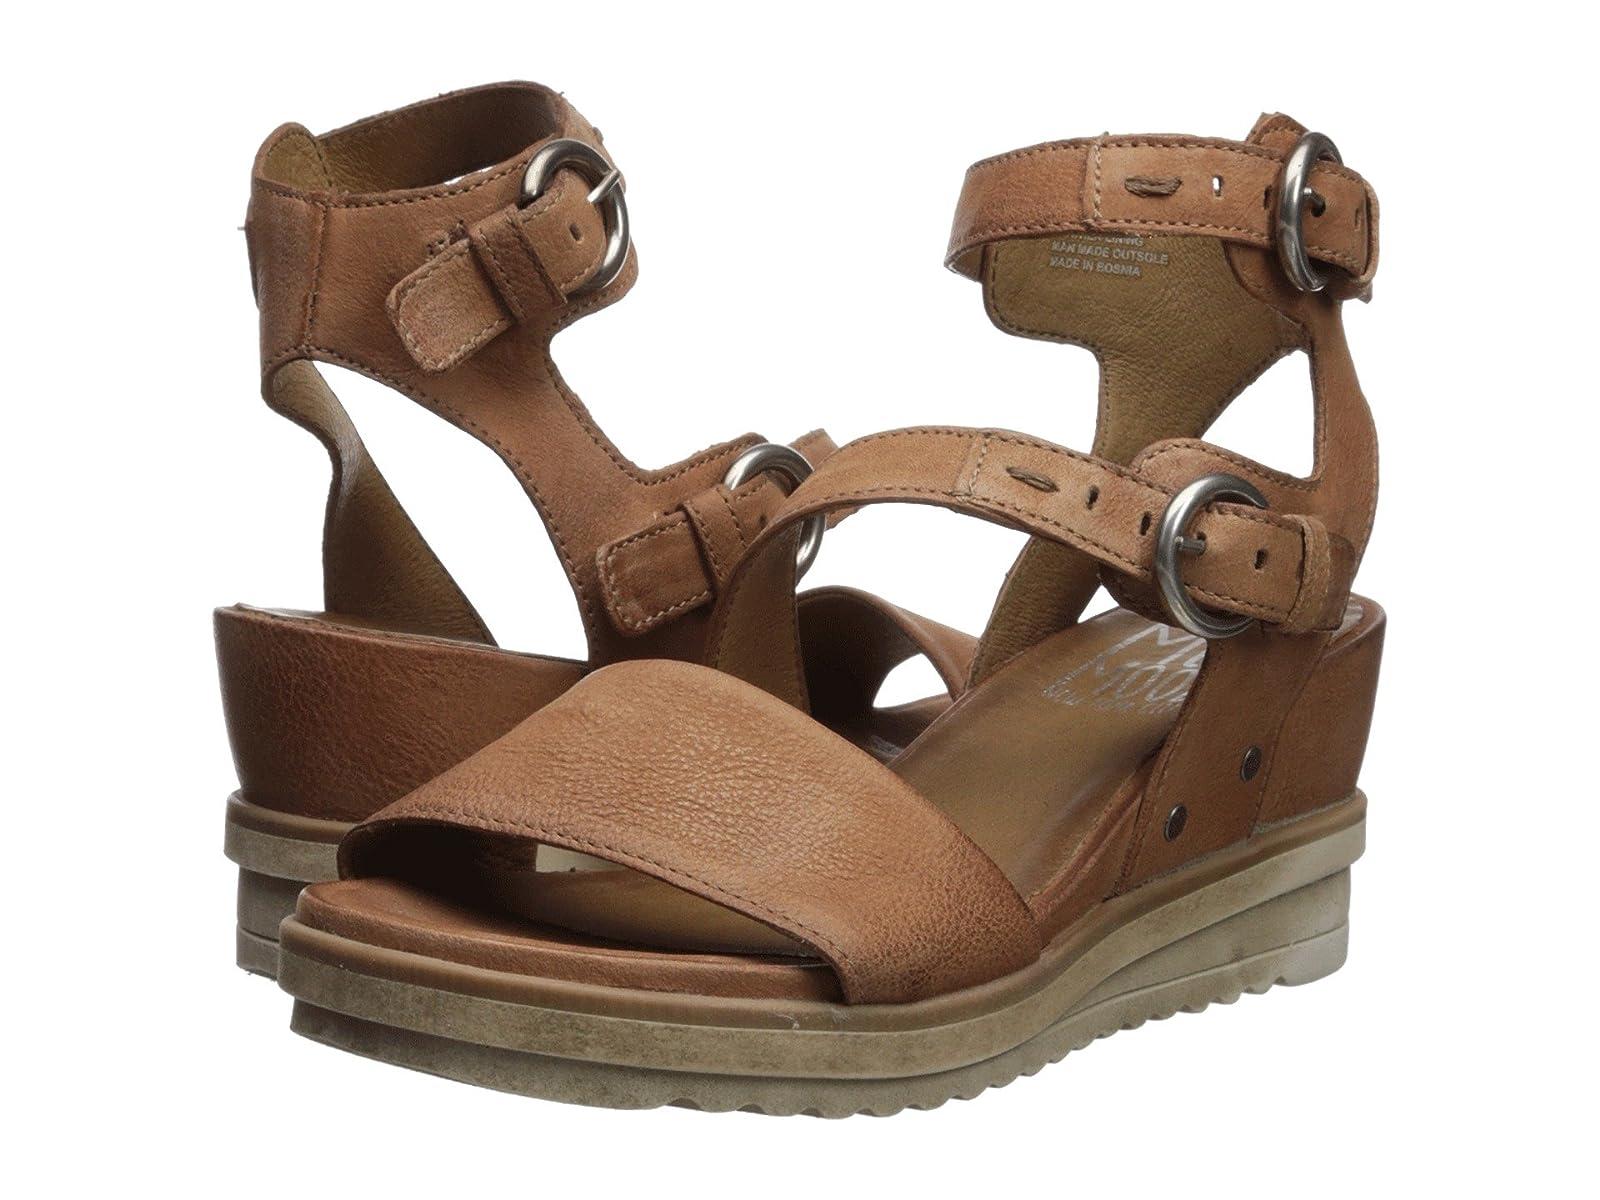 Miz Mooz MaliaAtmospheric grades have affordable shoes